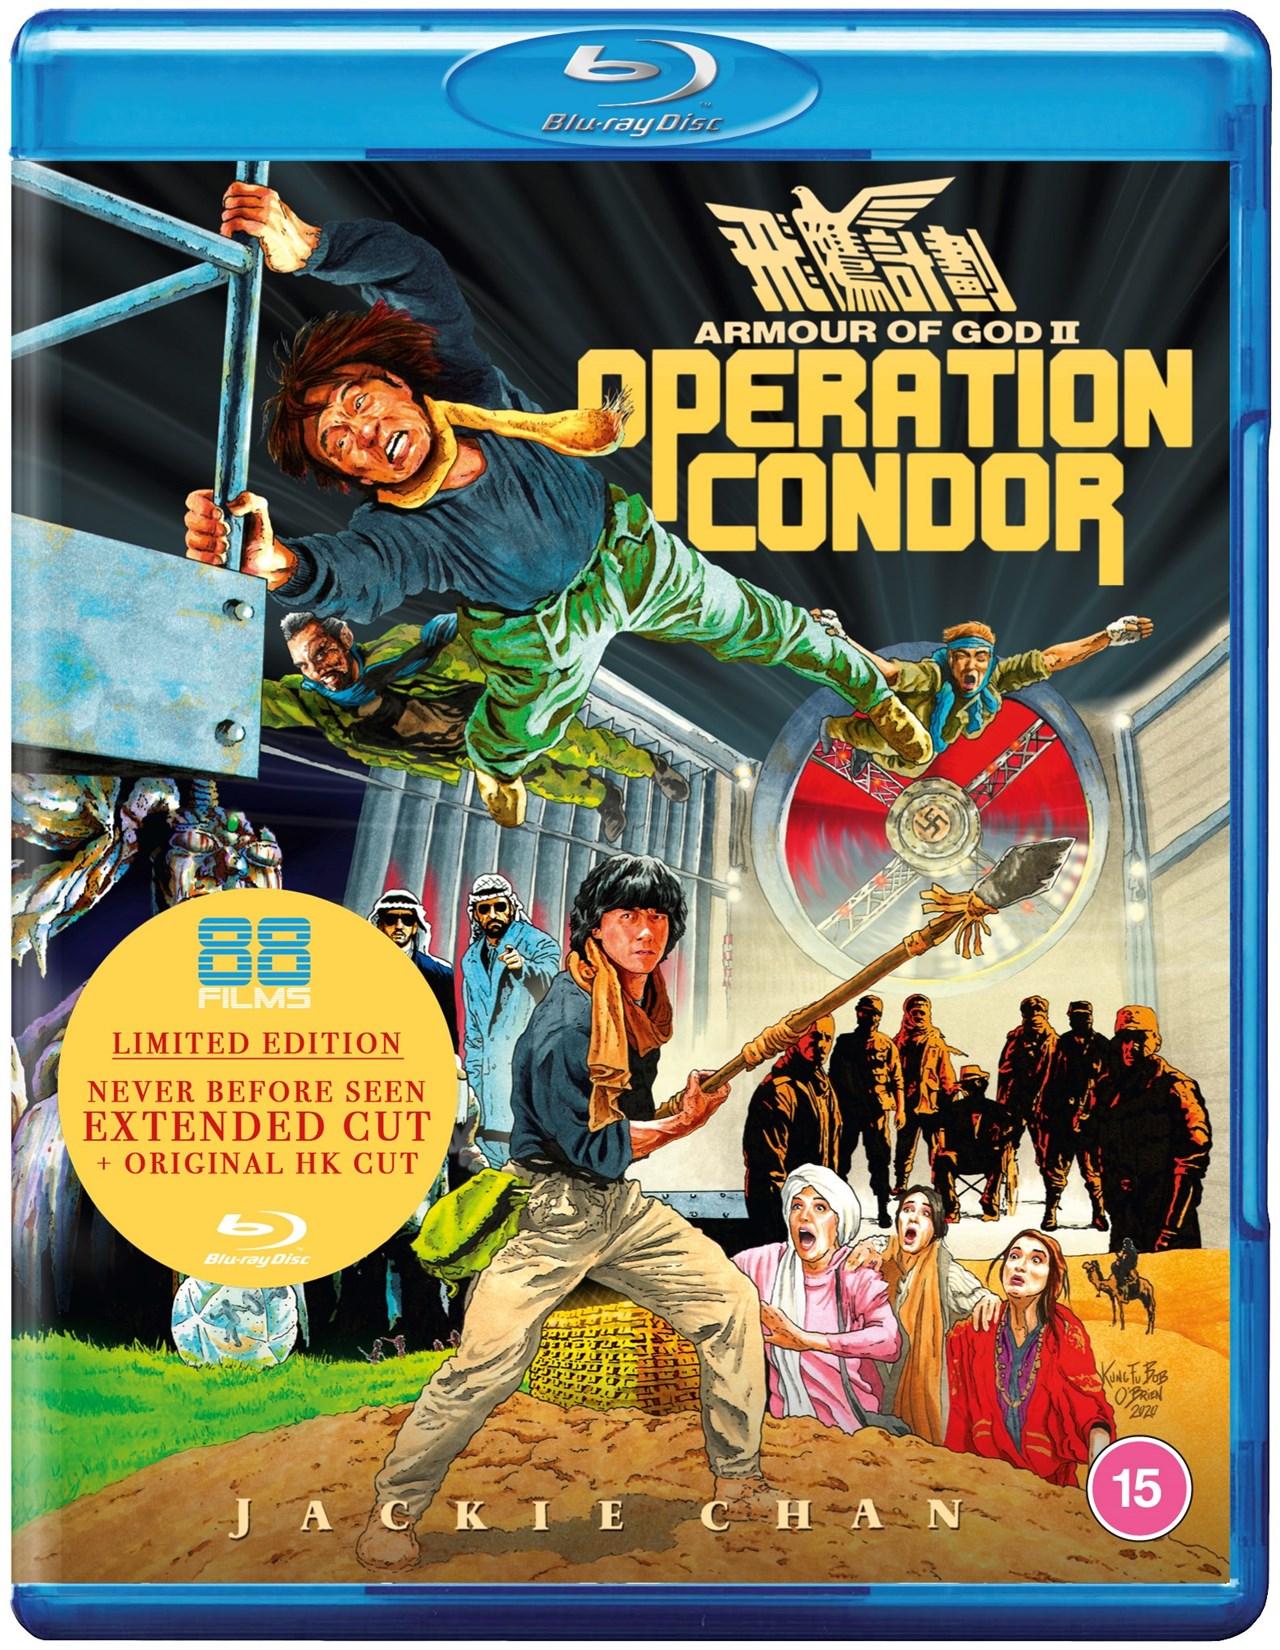 Armour of God II: Operation Condor - 1